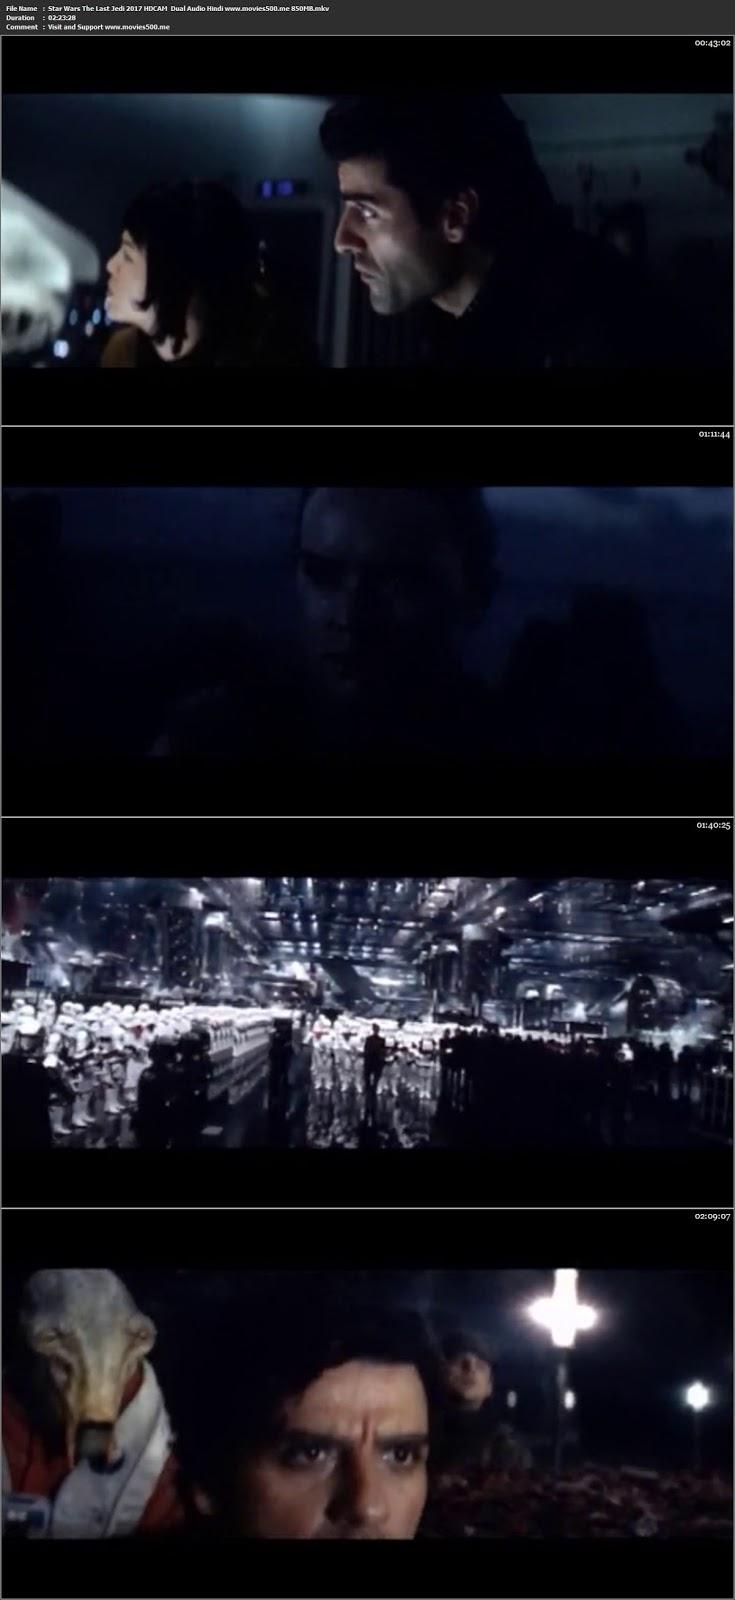 Star Wars The Last Jedi 2017 Dual Audio Hindi HDCAM 720p at newbtcbank.com